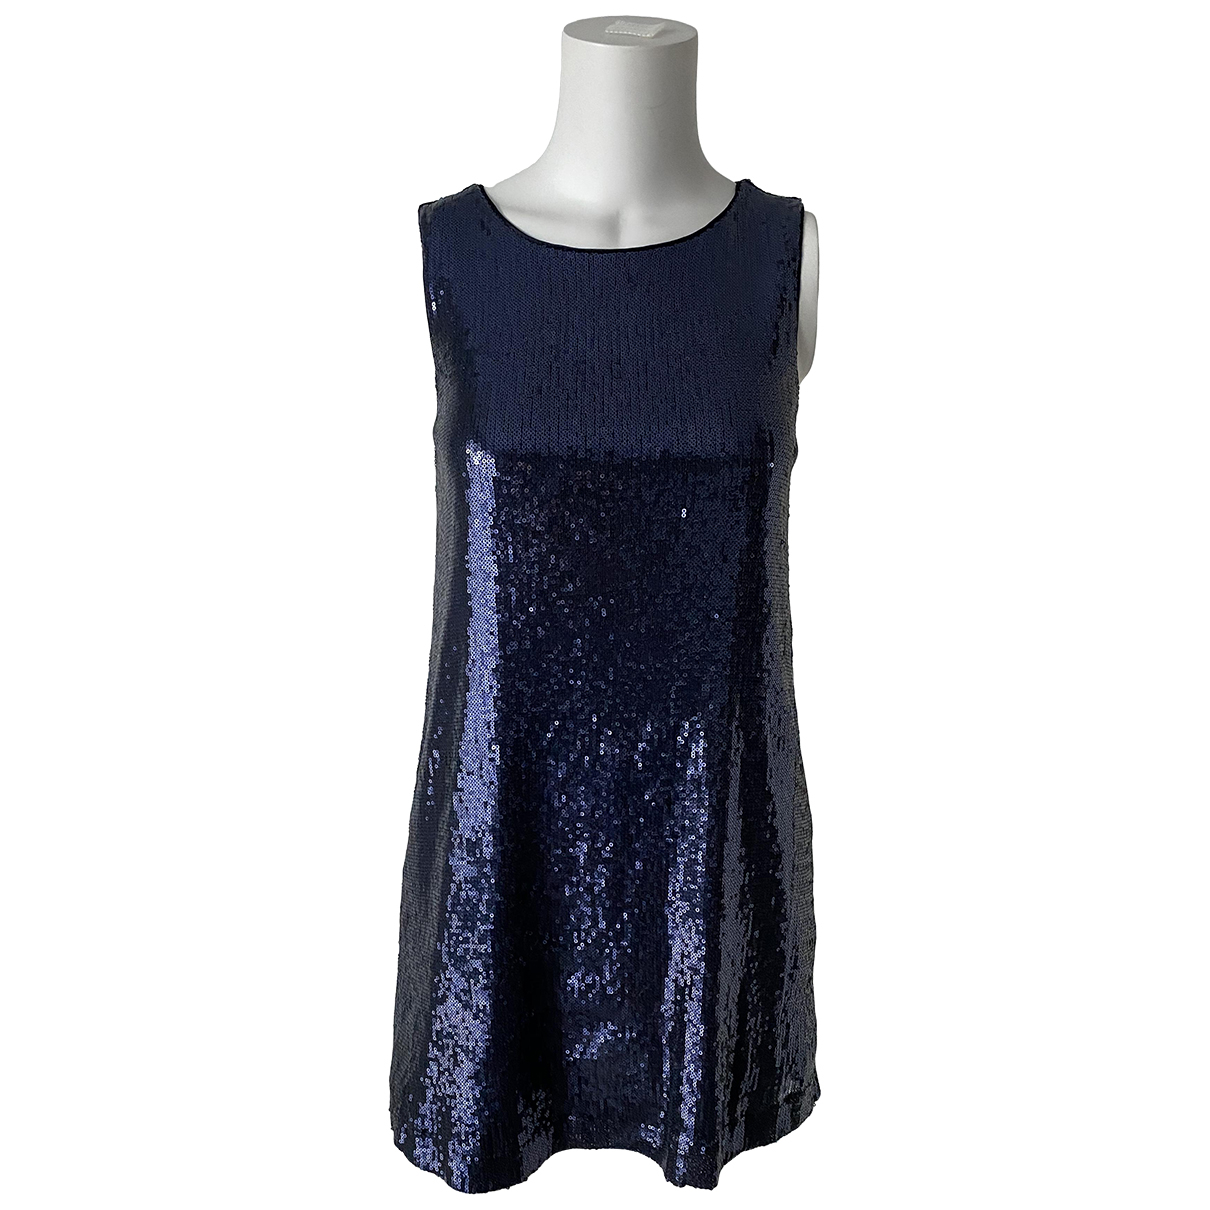 Jean Paul Gaultier \N Kleid in  Marine Mit Pailletten